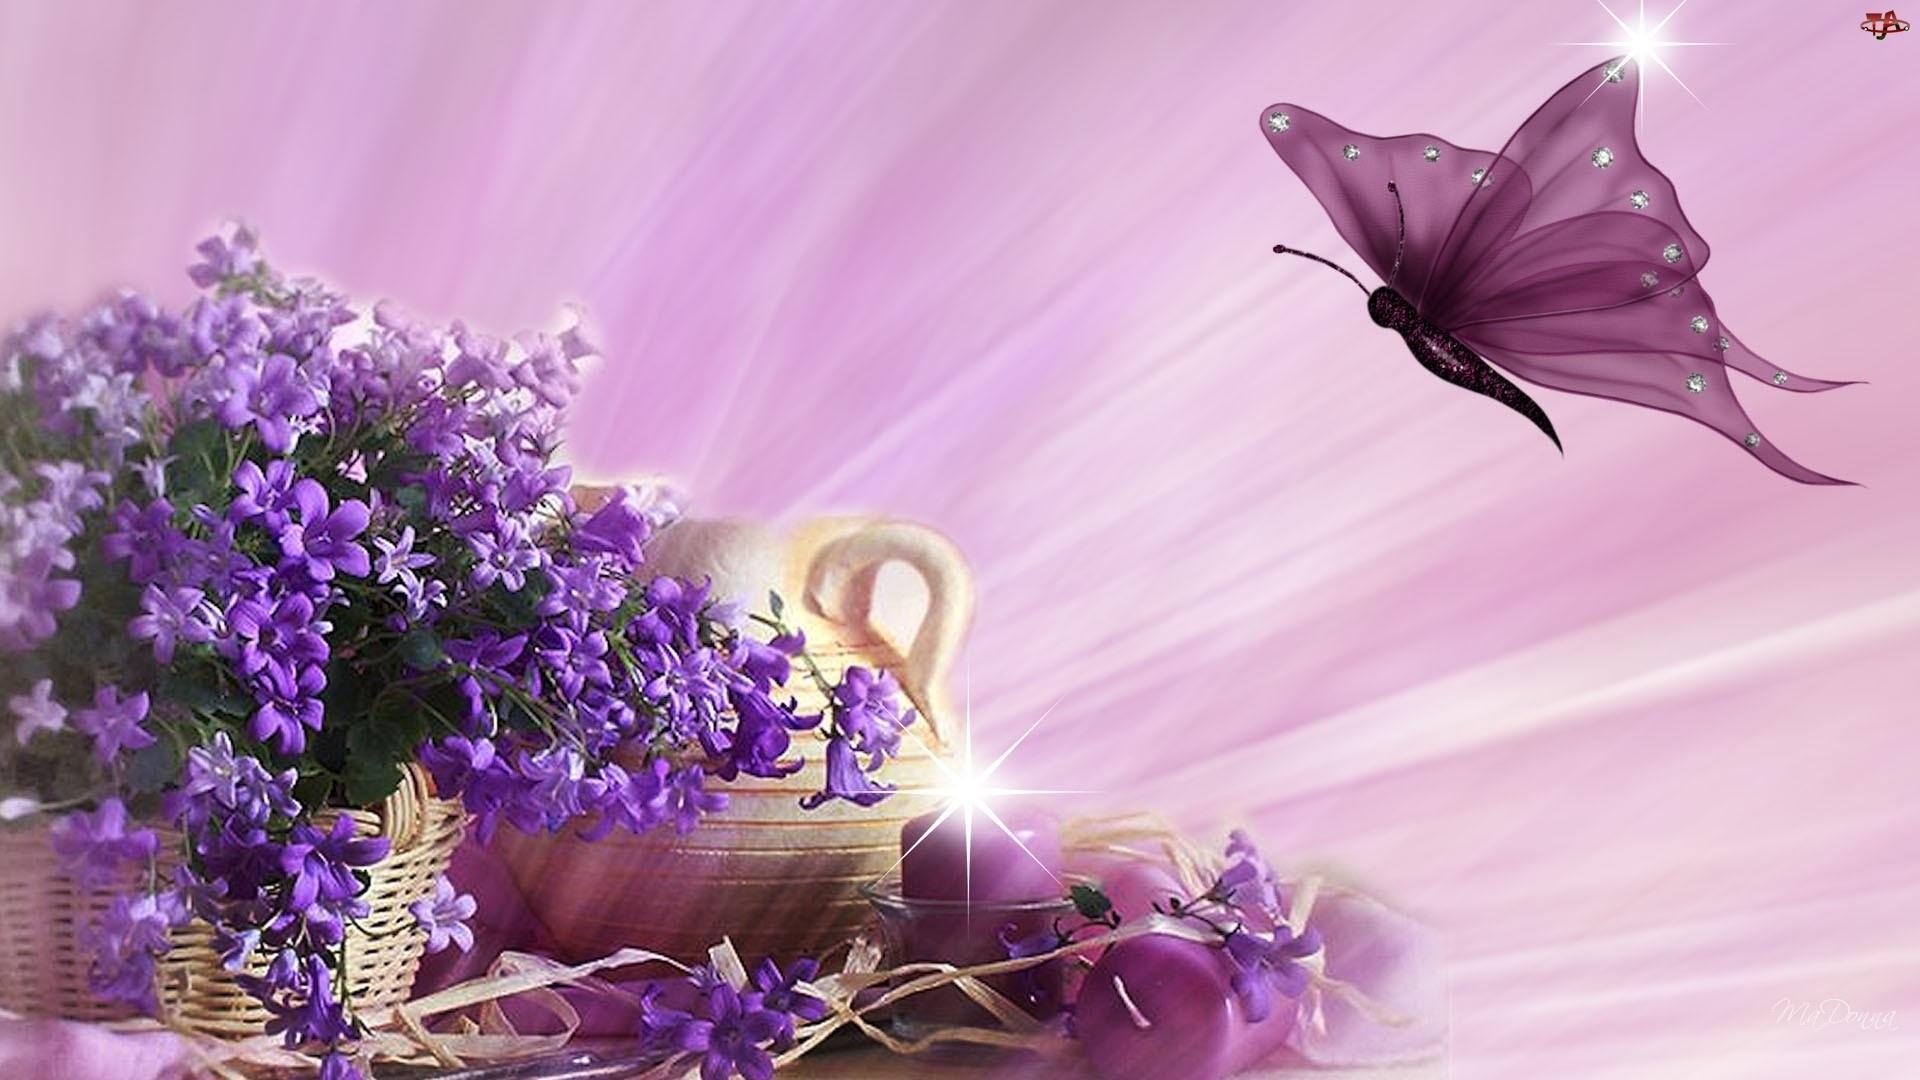 Motyl, Kwiaty, Koszyk